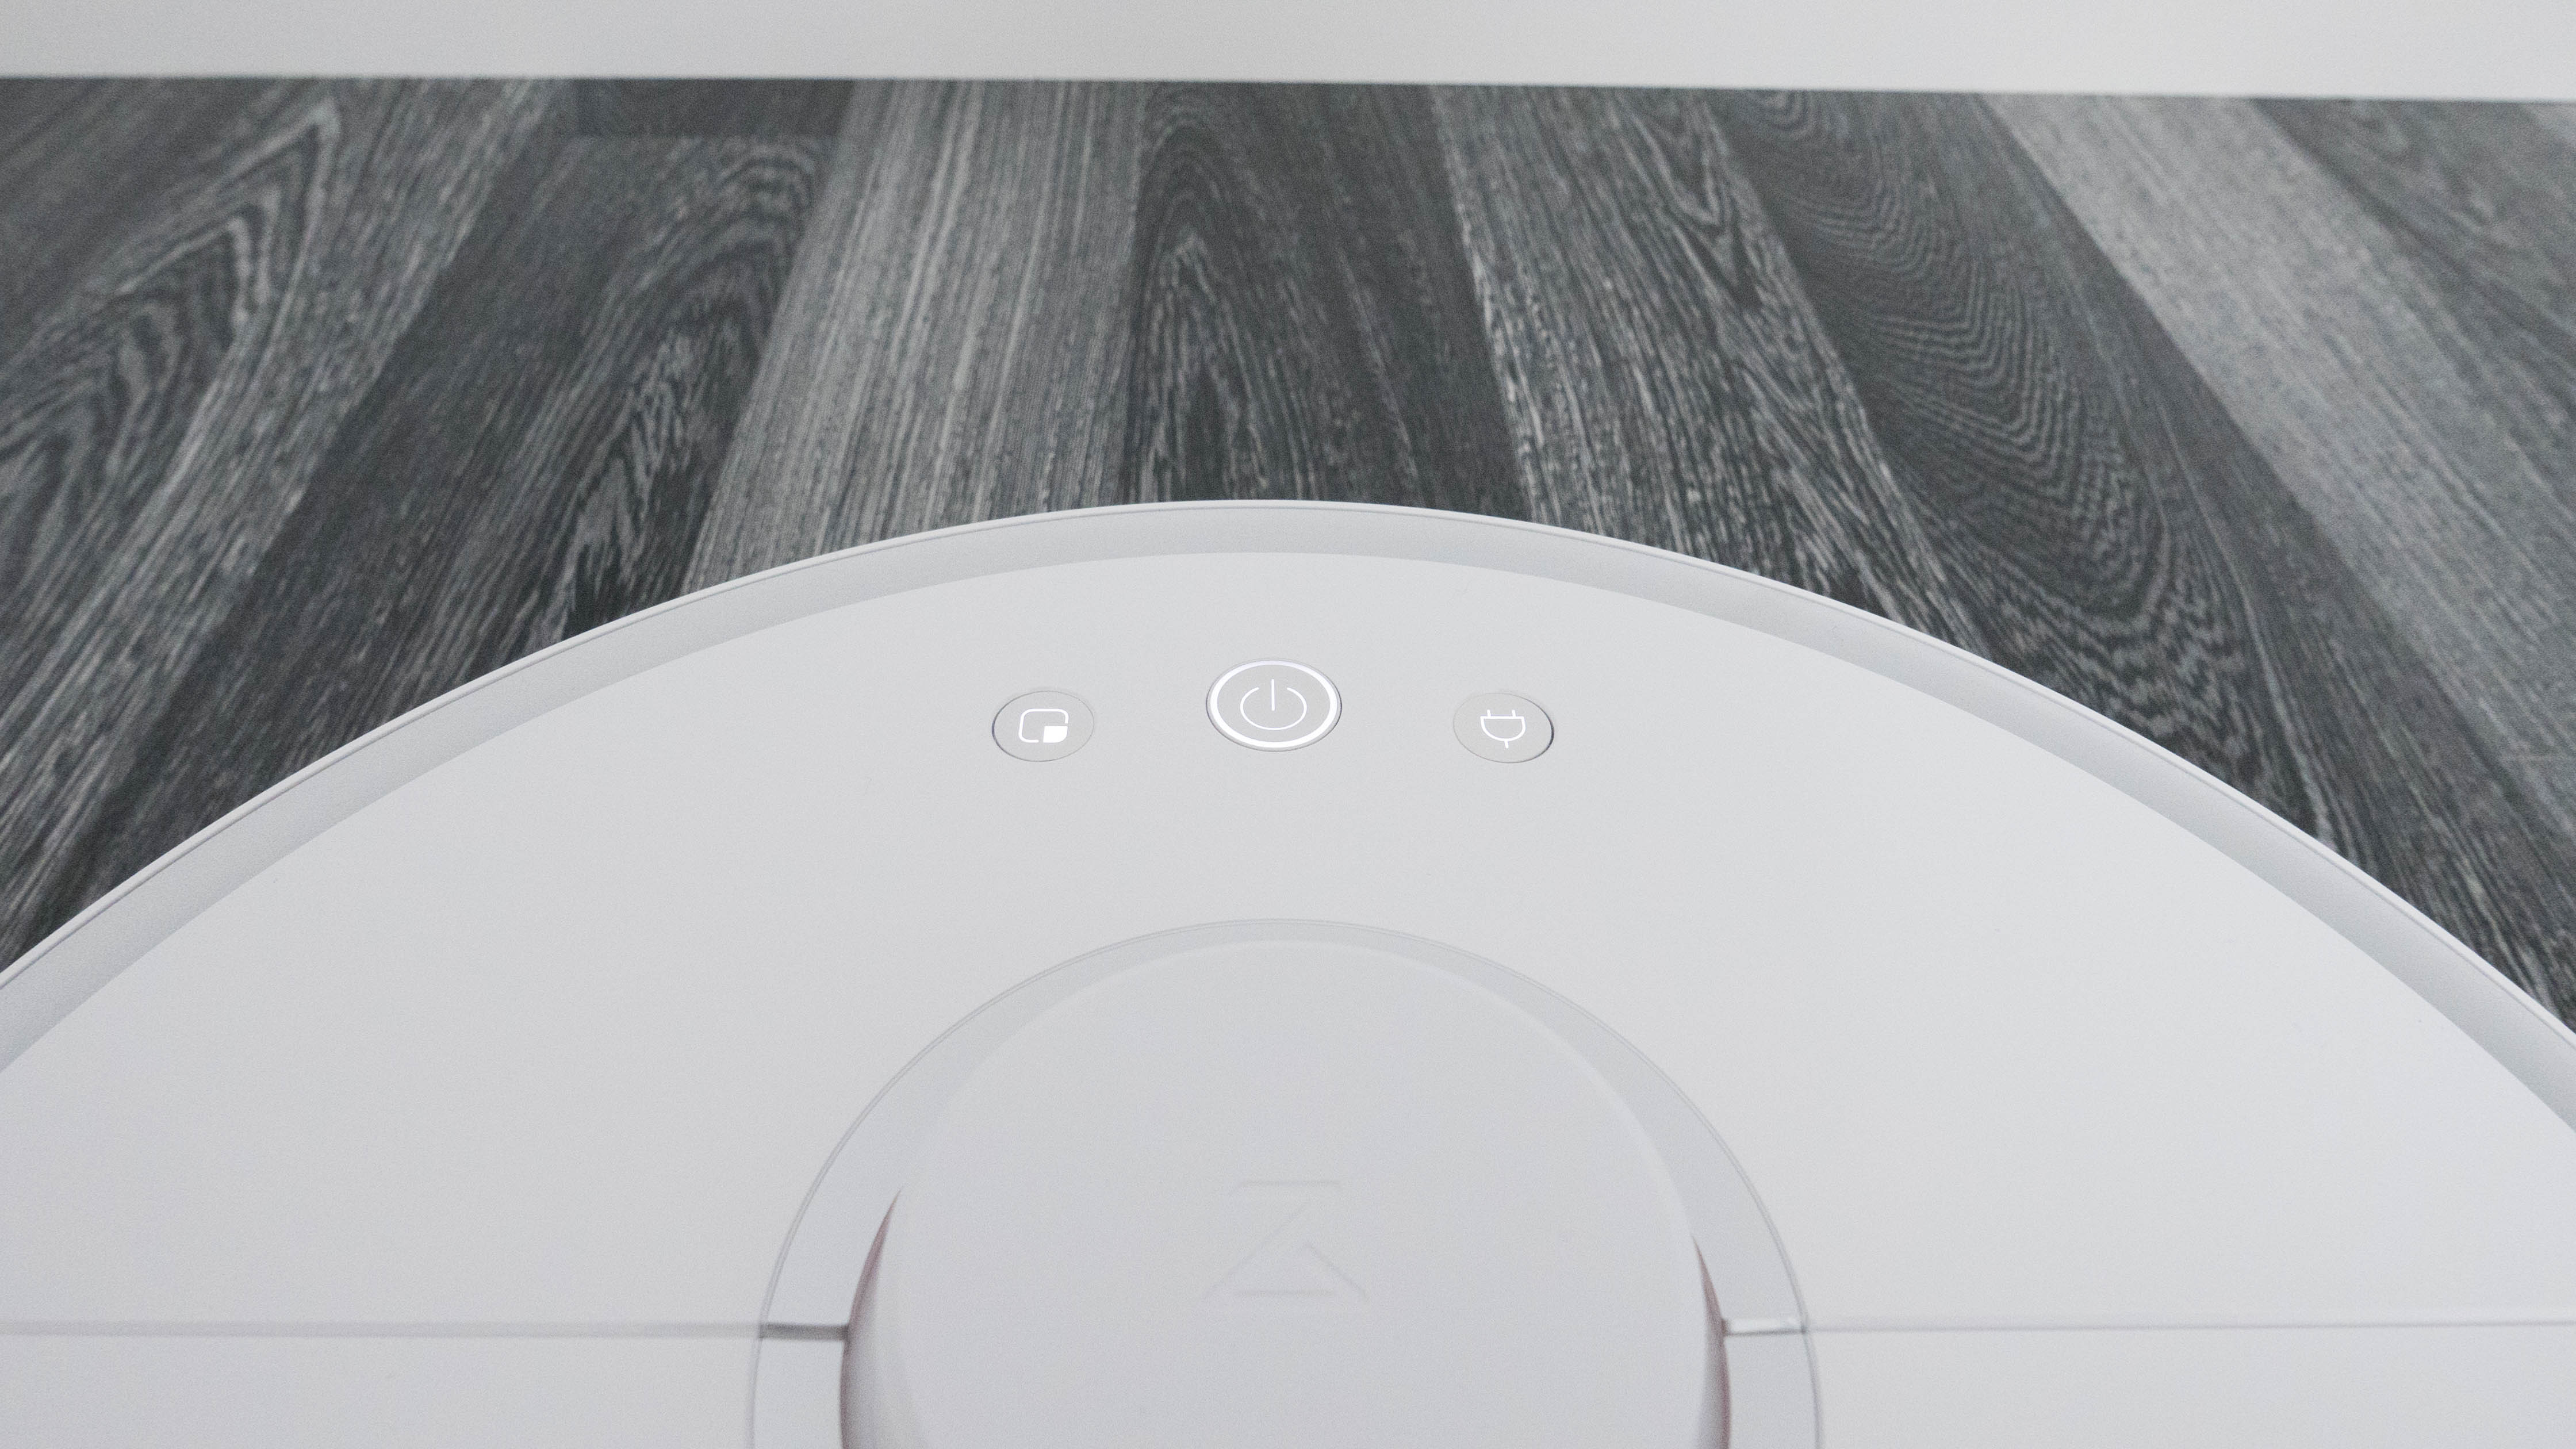 Xiaomi Mi Robot 2 Roborock S50 Roboter Details 12